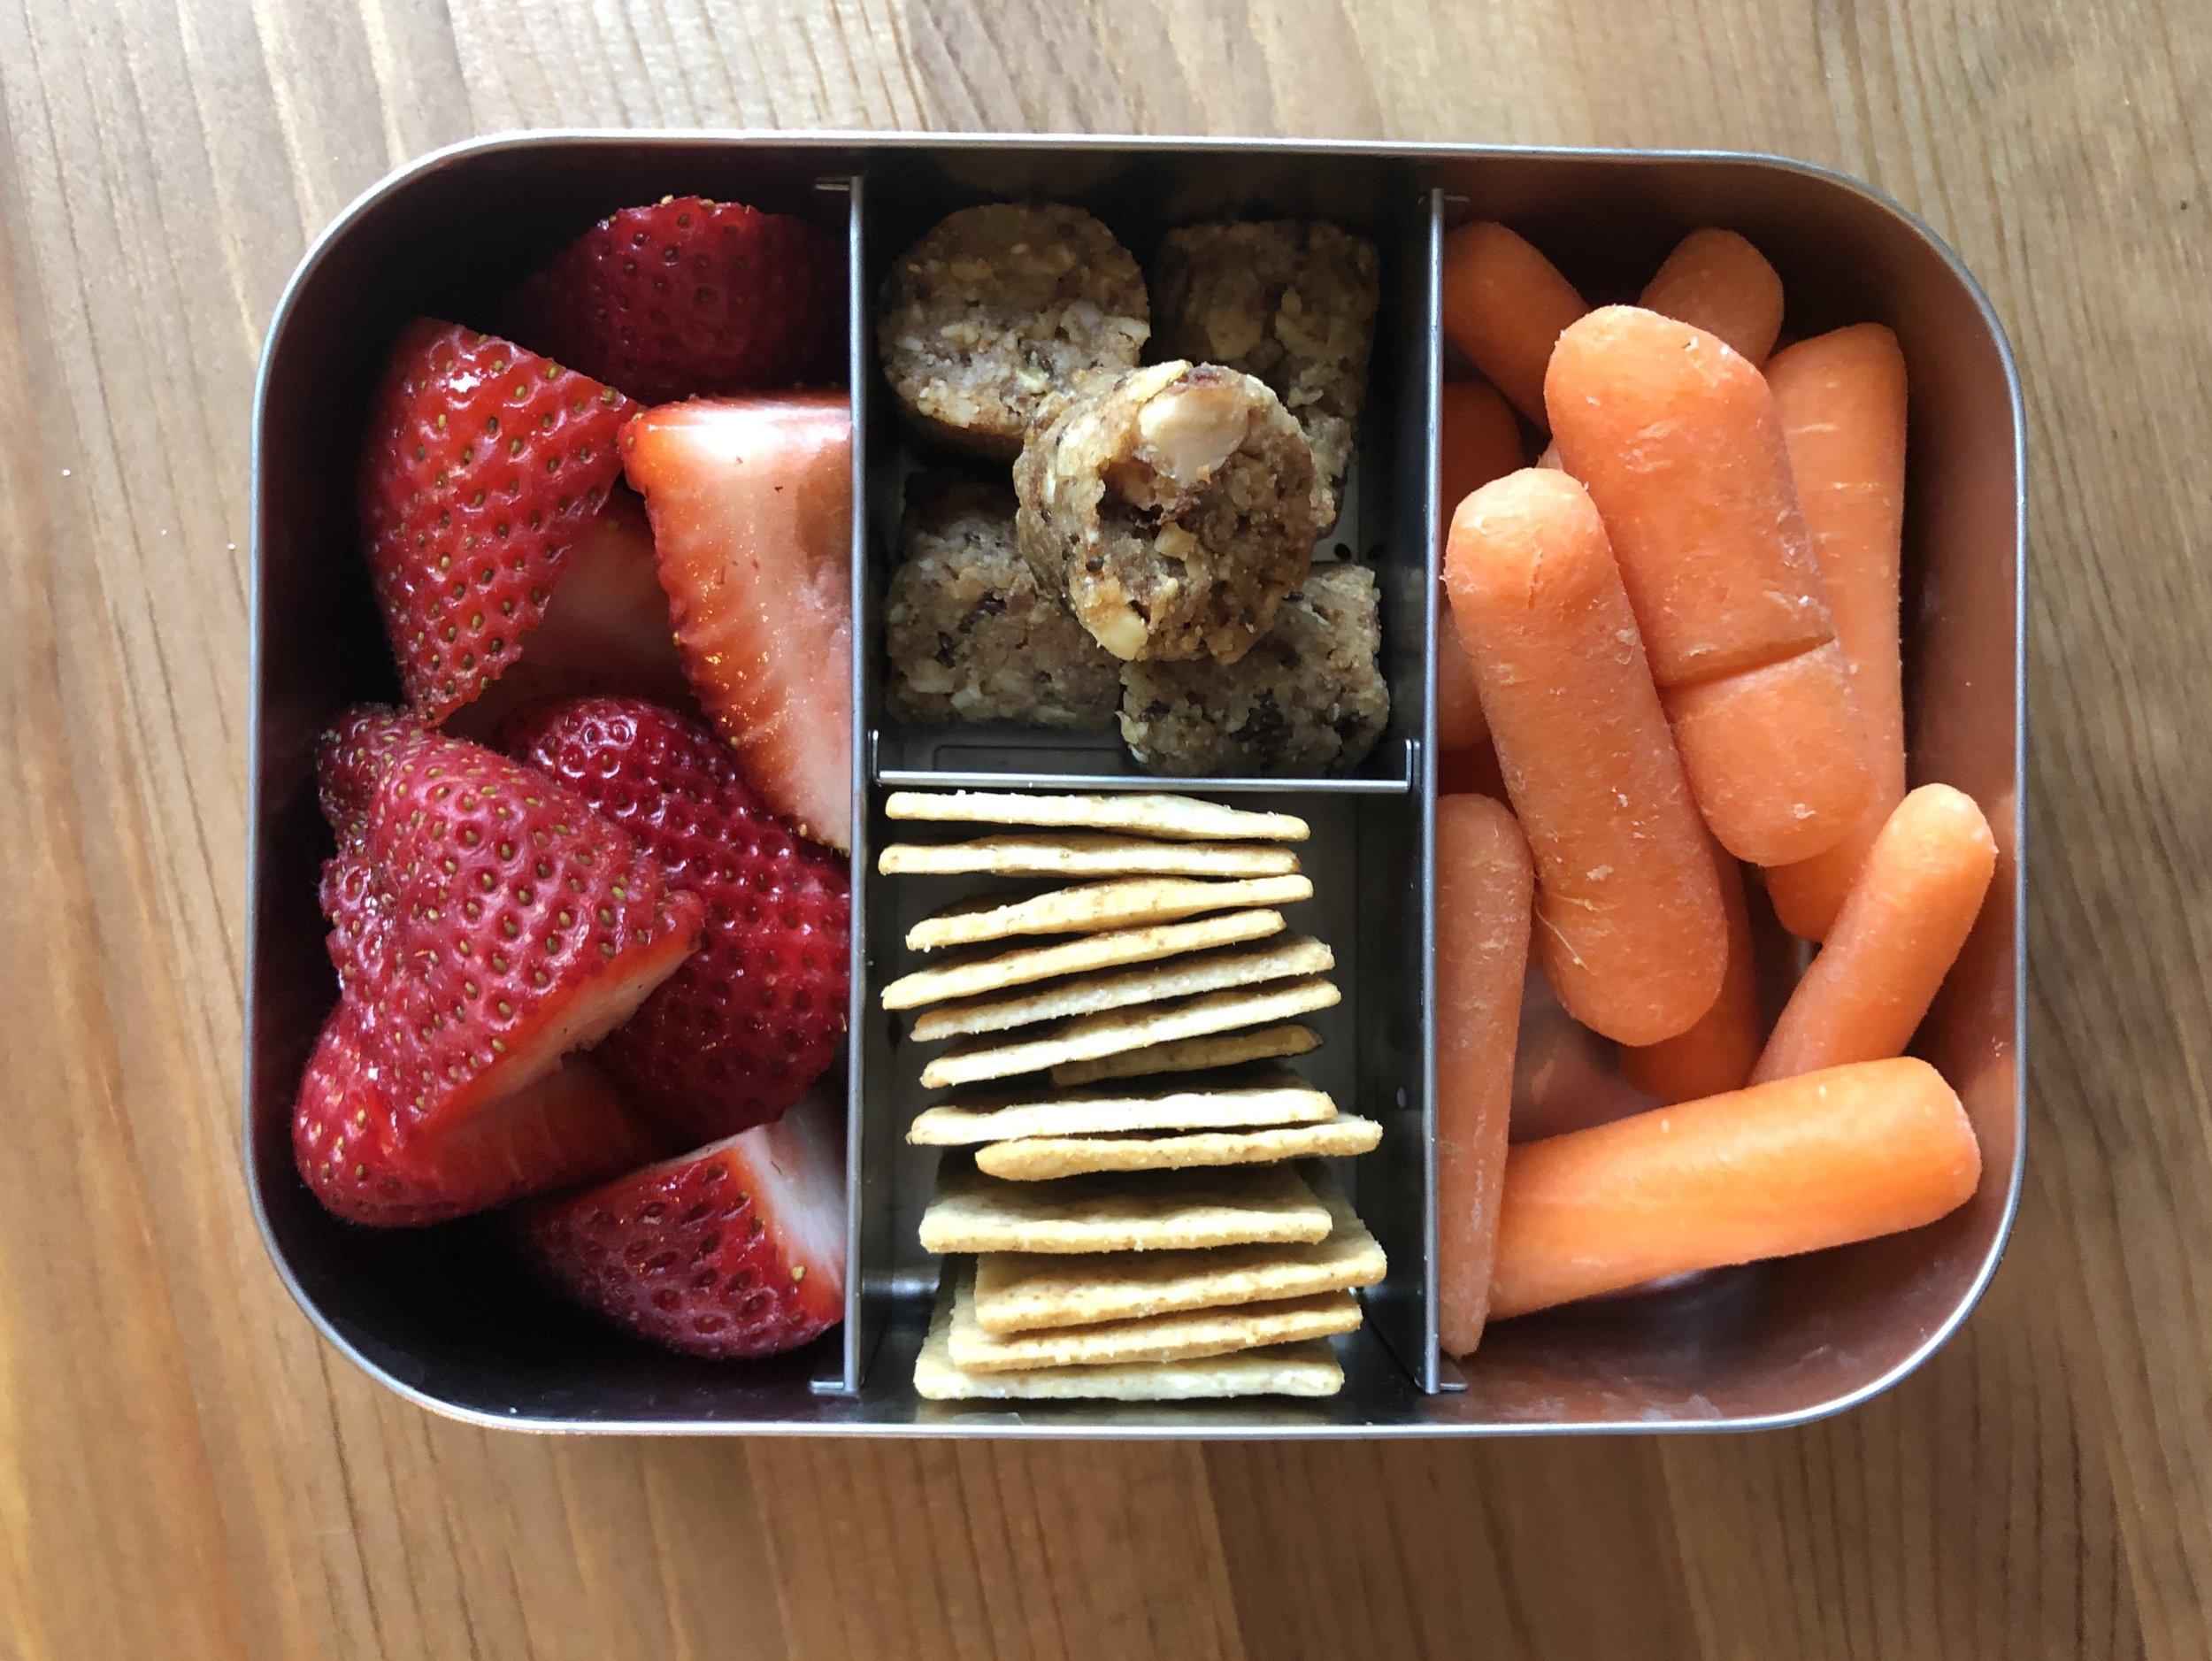 strawberries, paleo crackers, carrots, paleo bites